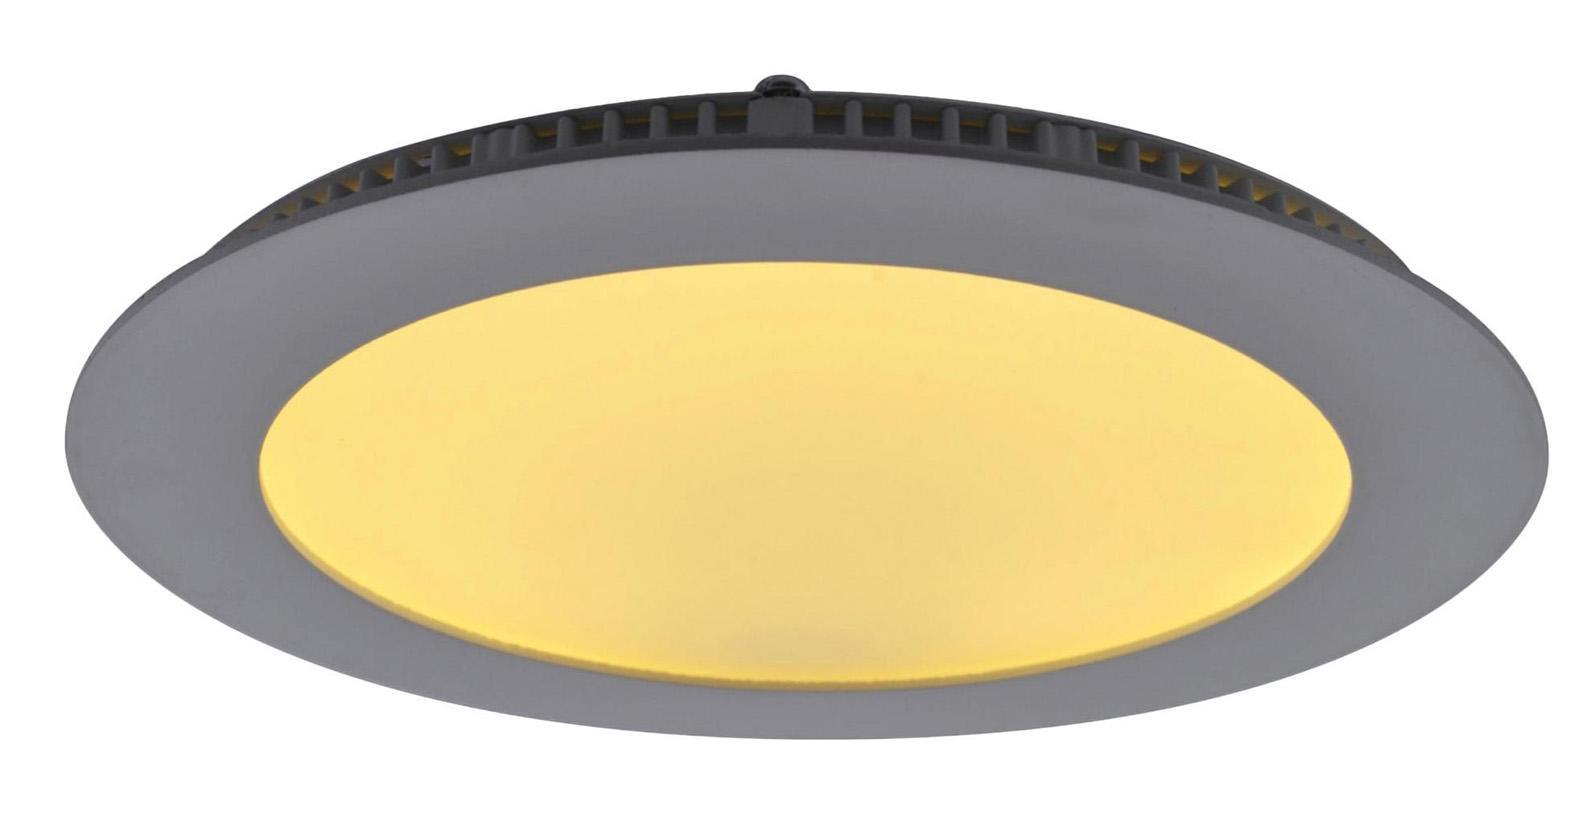 A2612PL-1WH FINE Встраиваемый светильникA2612PL-1WH12W LED; 960 lm